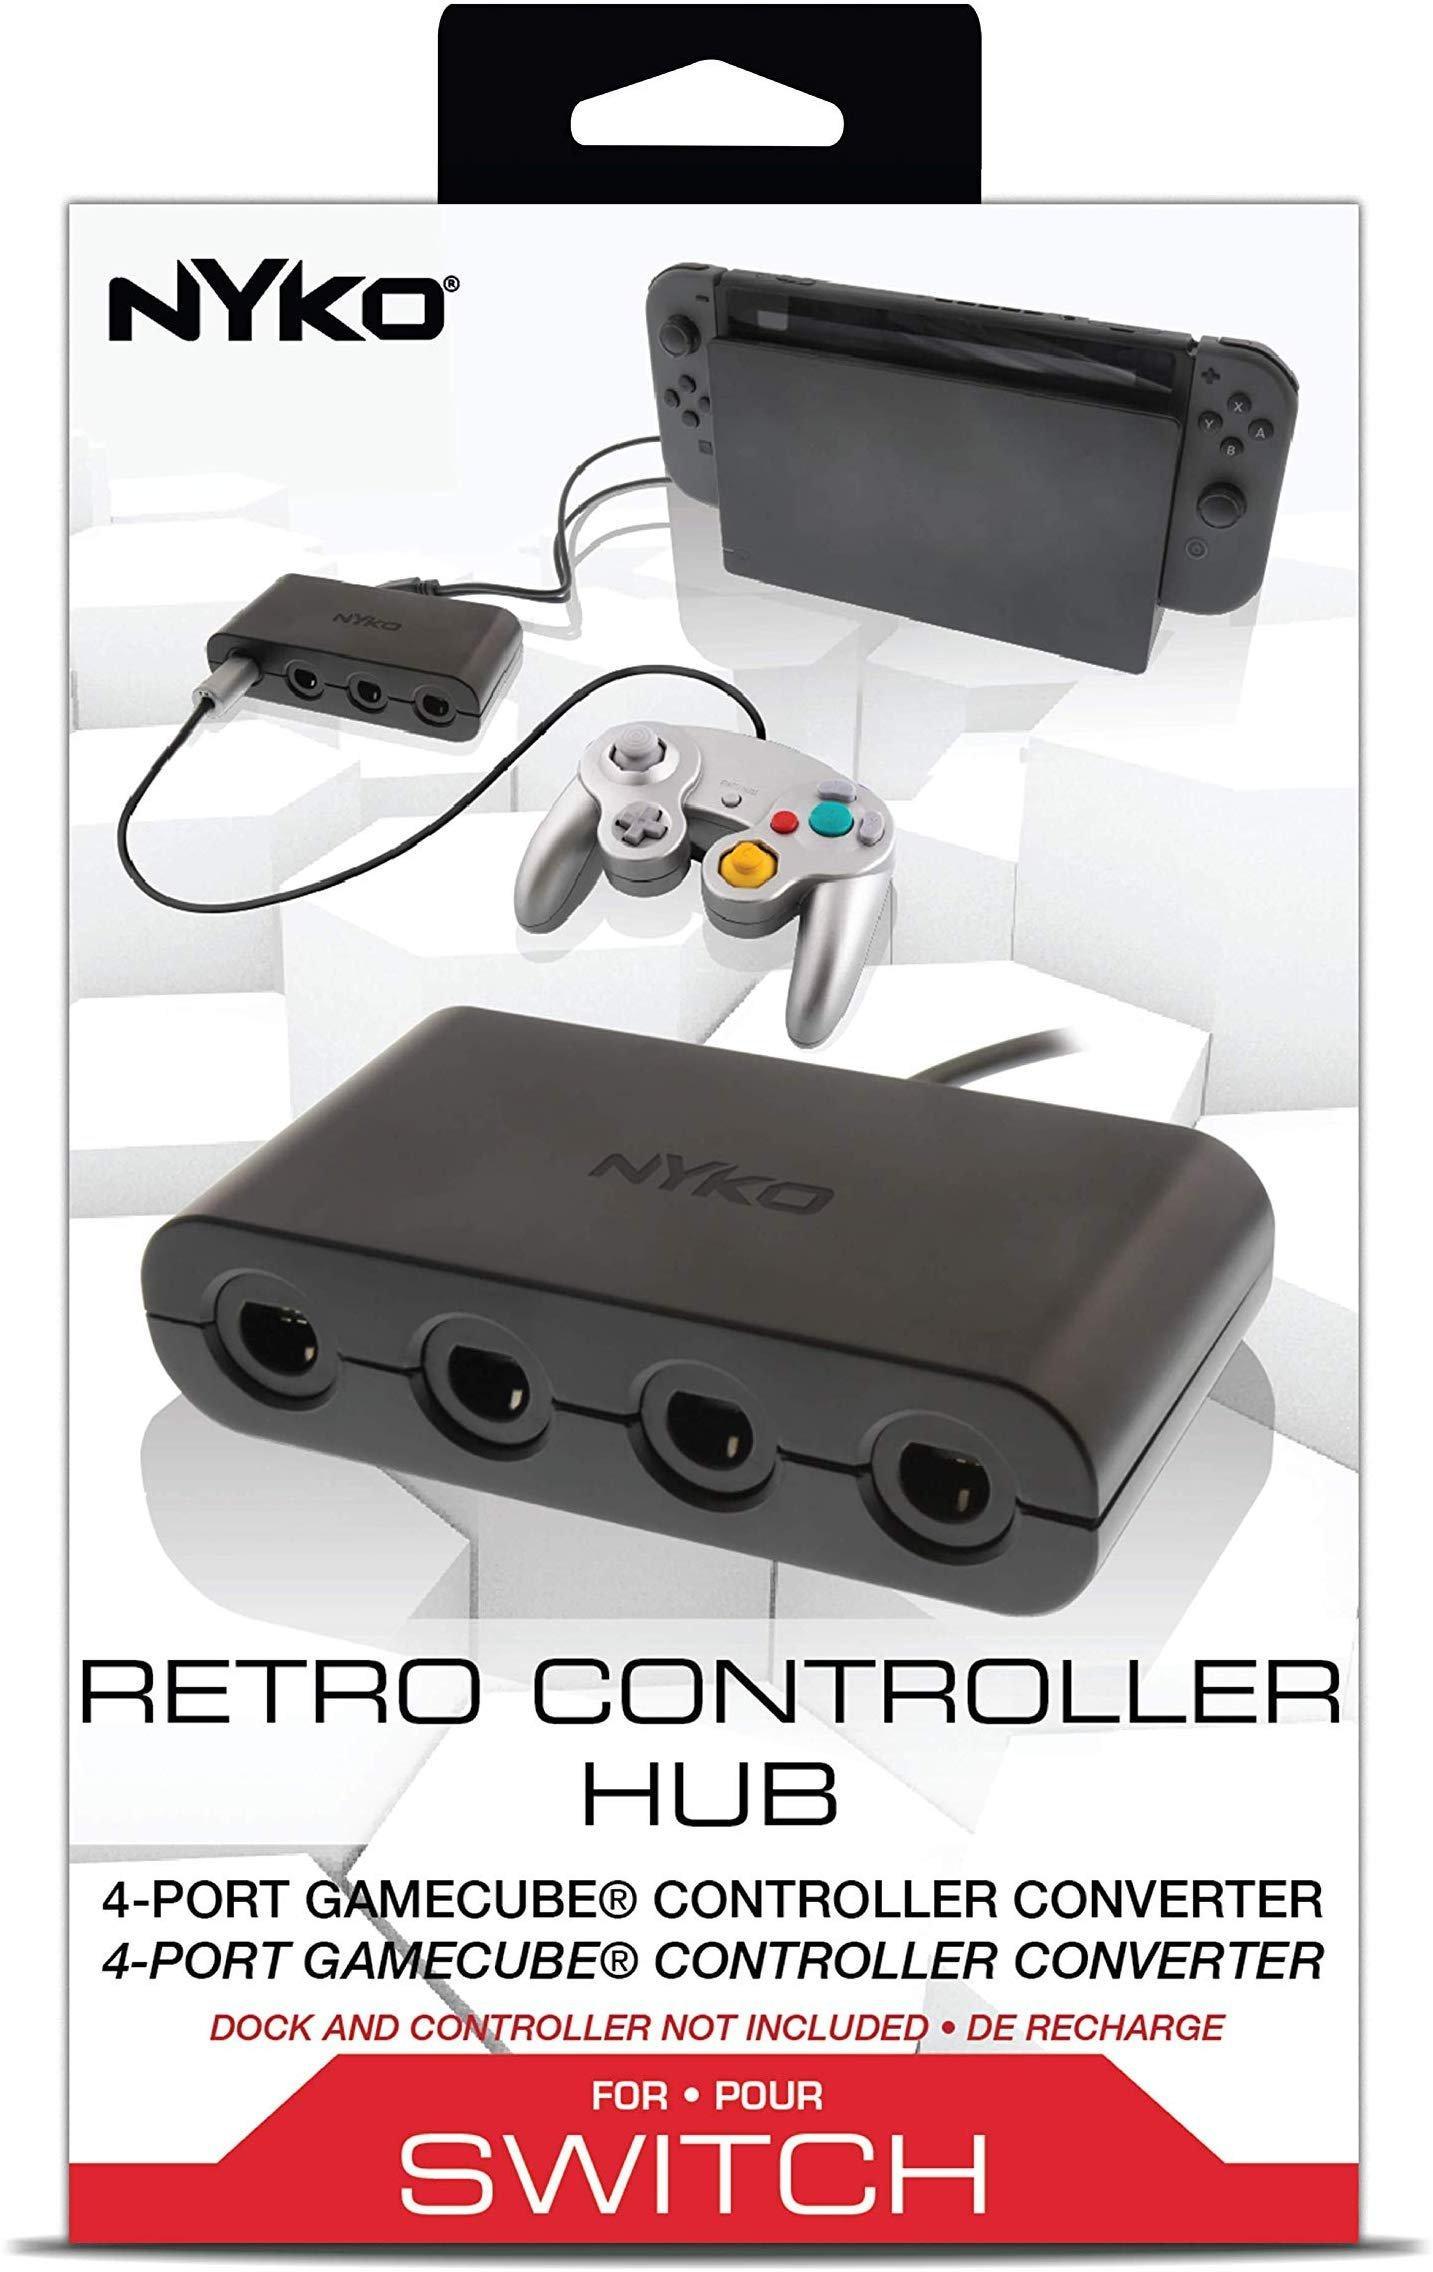 Nintendo Switch Nyko GameCube Retro Controller Hub   Nintendo Switch    GameStop